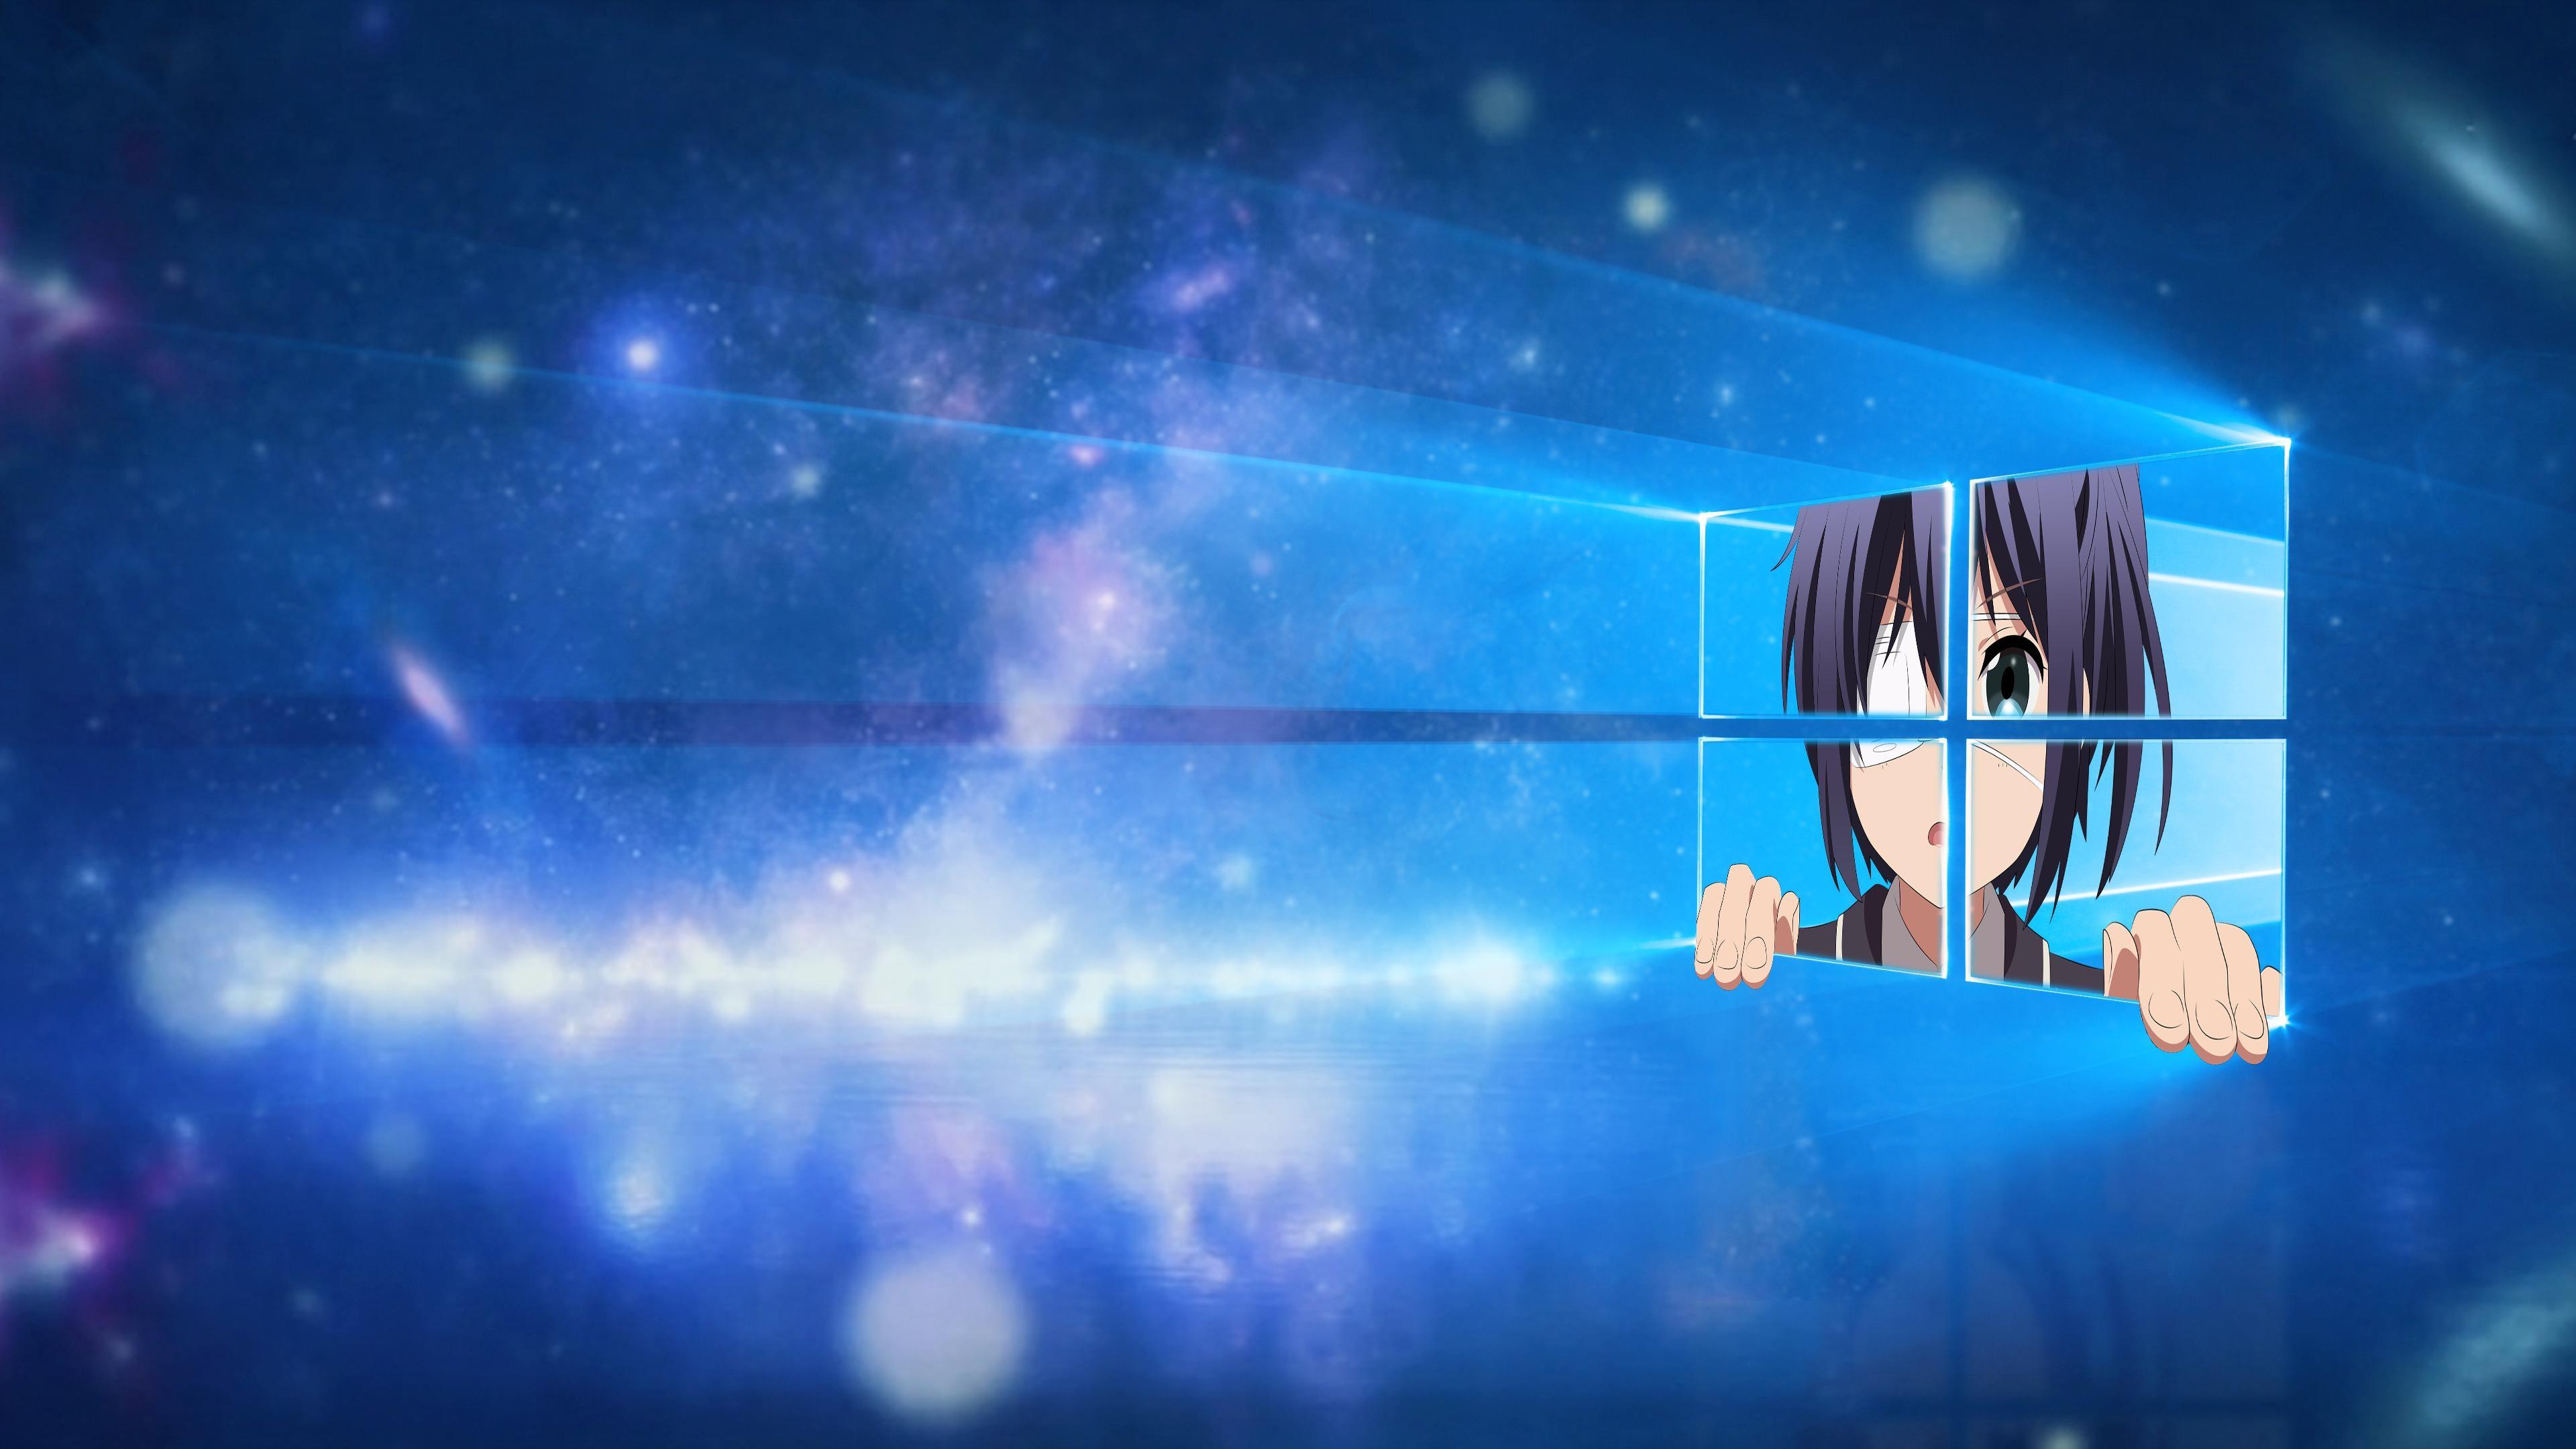 3840x2160 4k Anime Wallpaper Desktop Download Cool